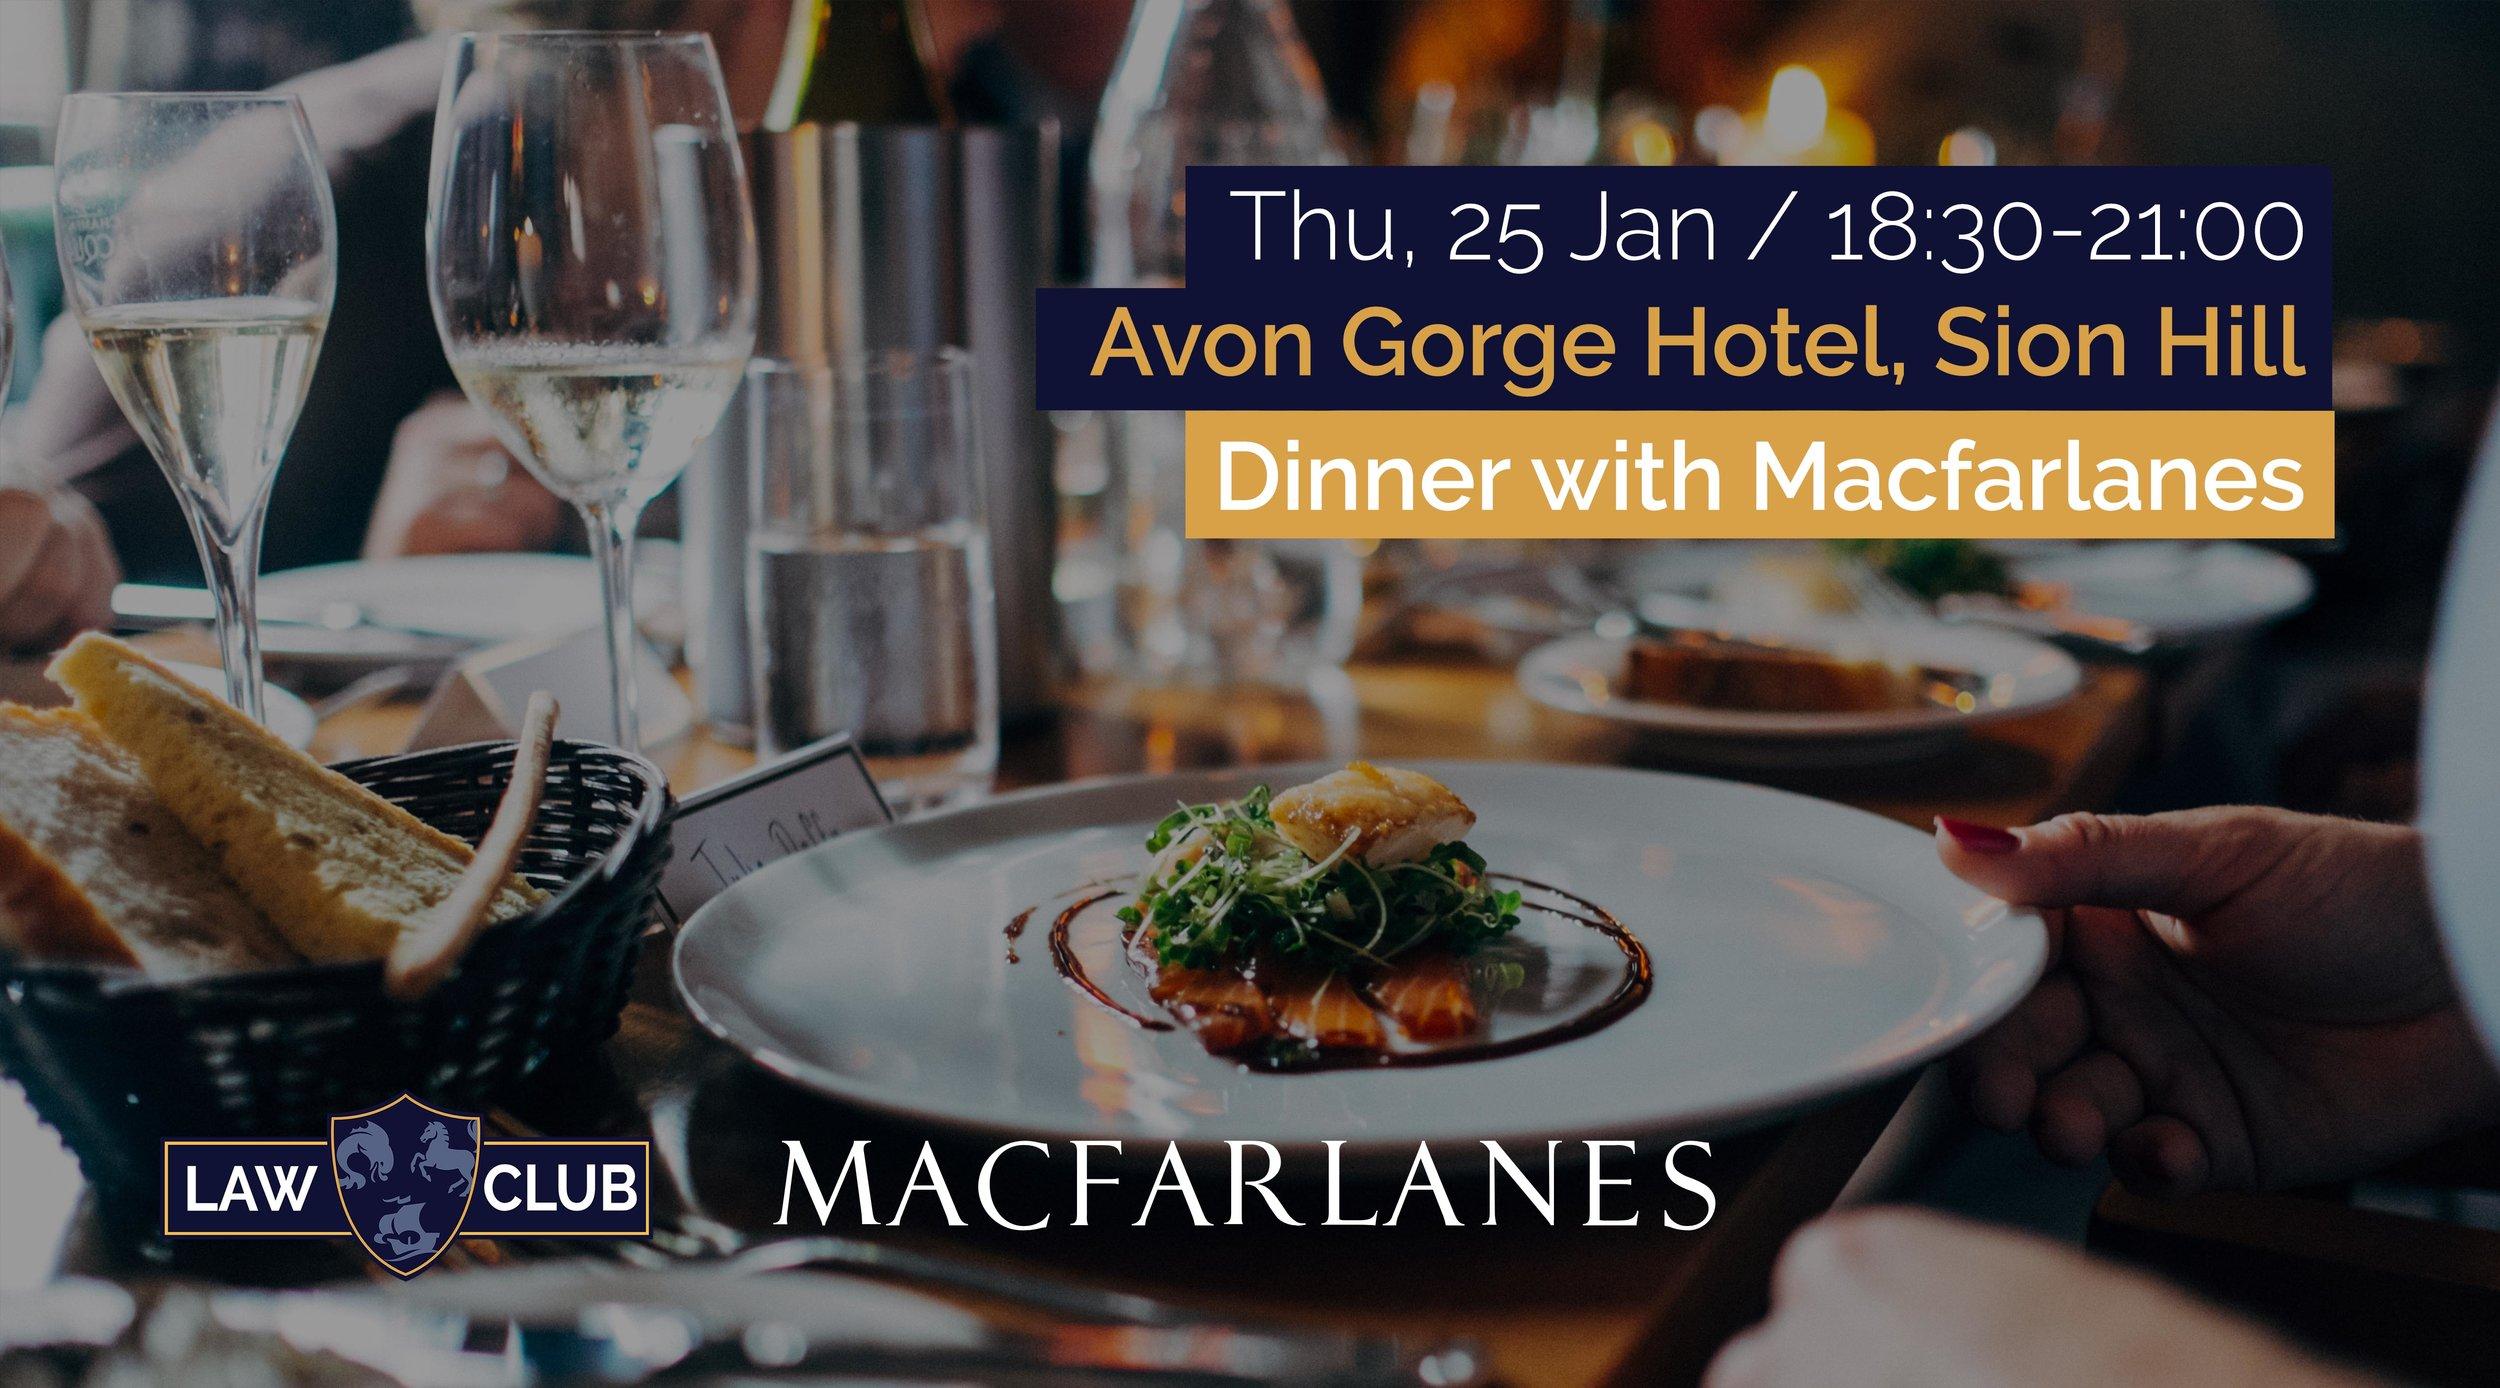 new dinner with macfarlanes.jpg